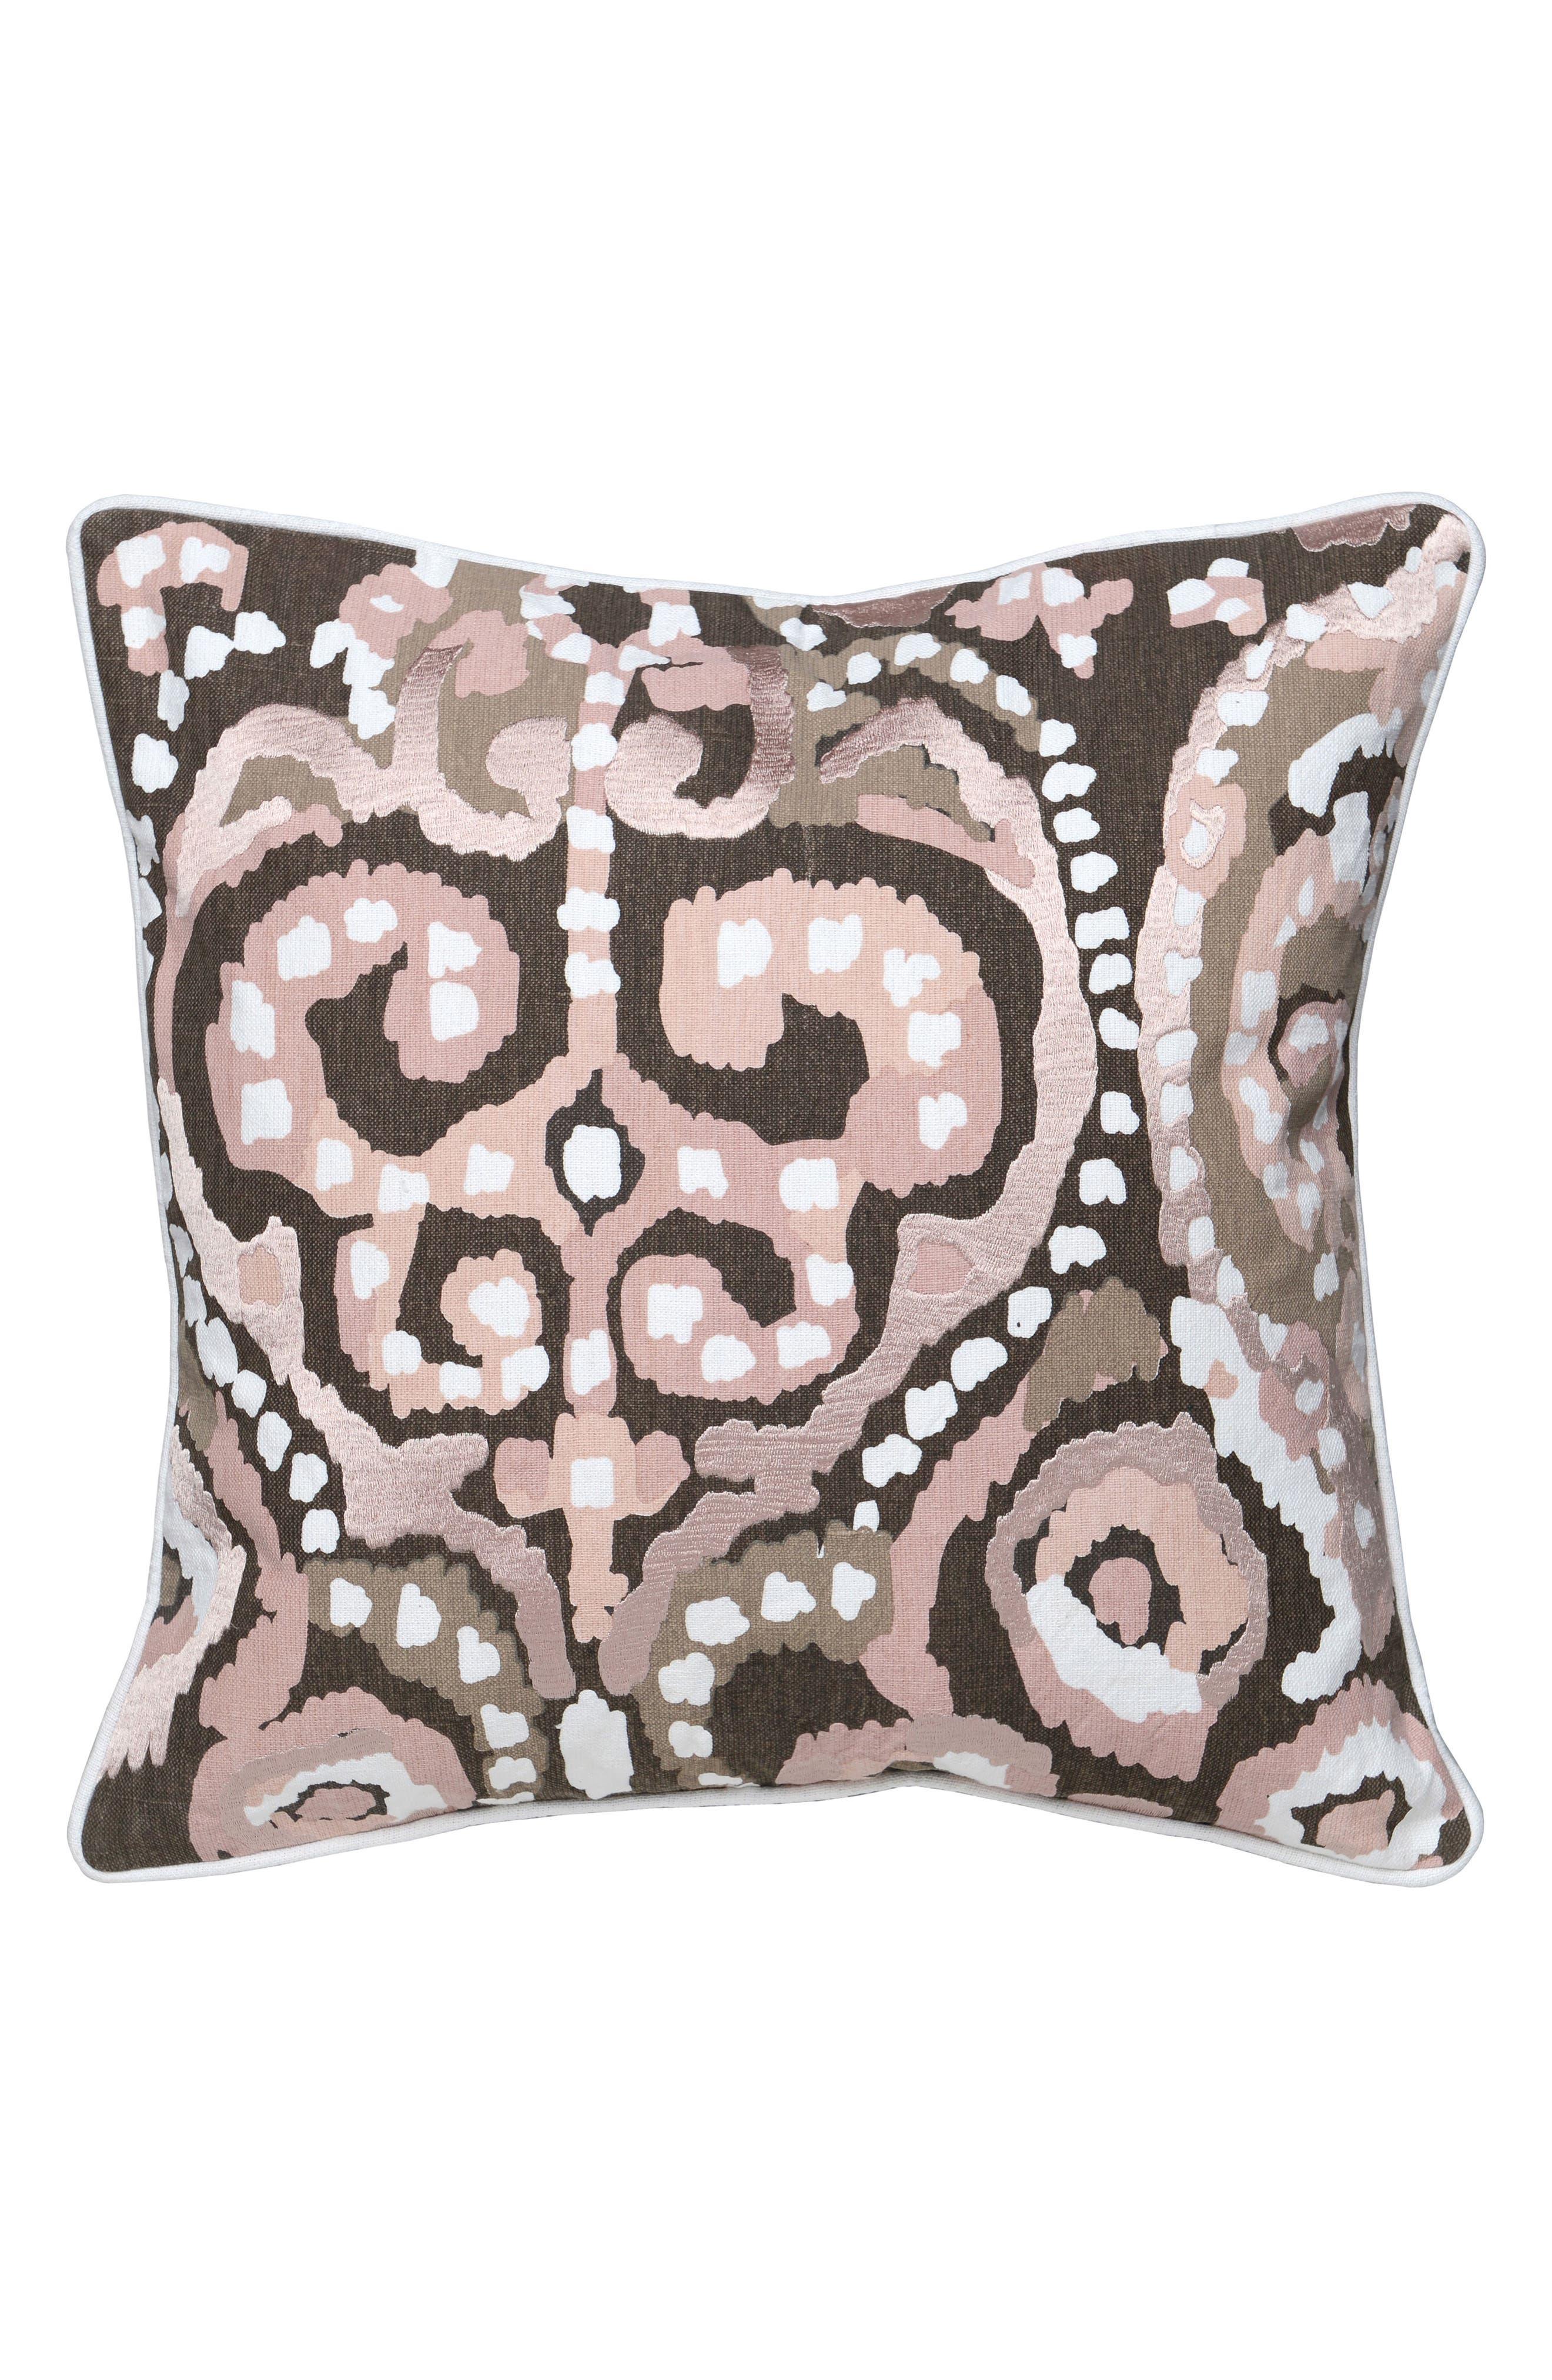 Mina Accent Pillow,                         Main,                         color, BLUSH/ BROWN